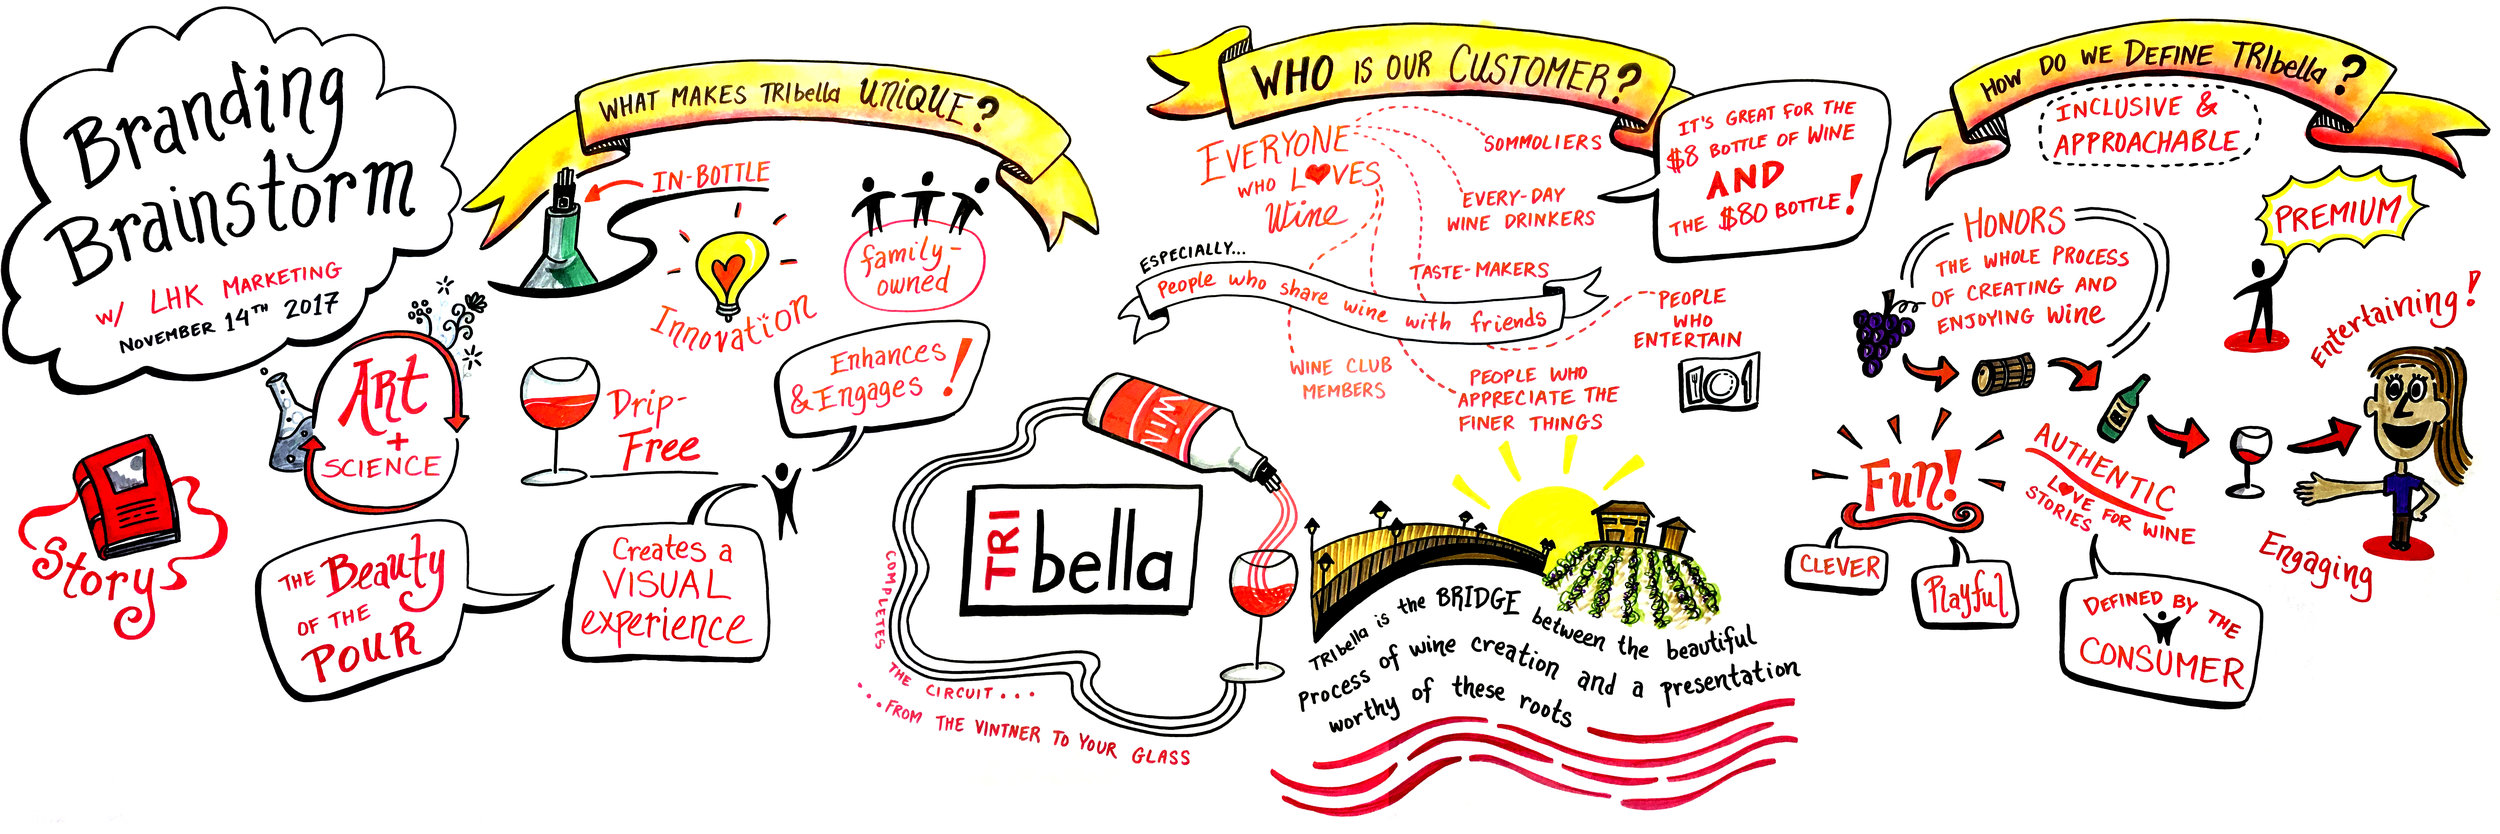 TRIbella Branding Brainstorm 2017